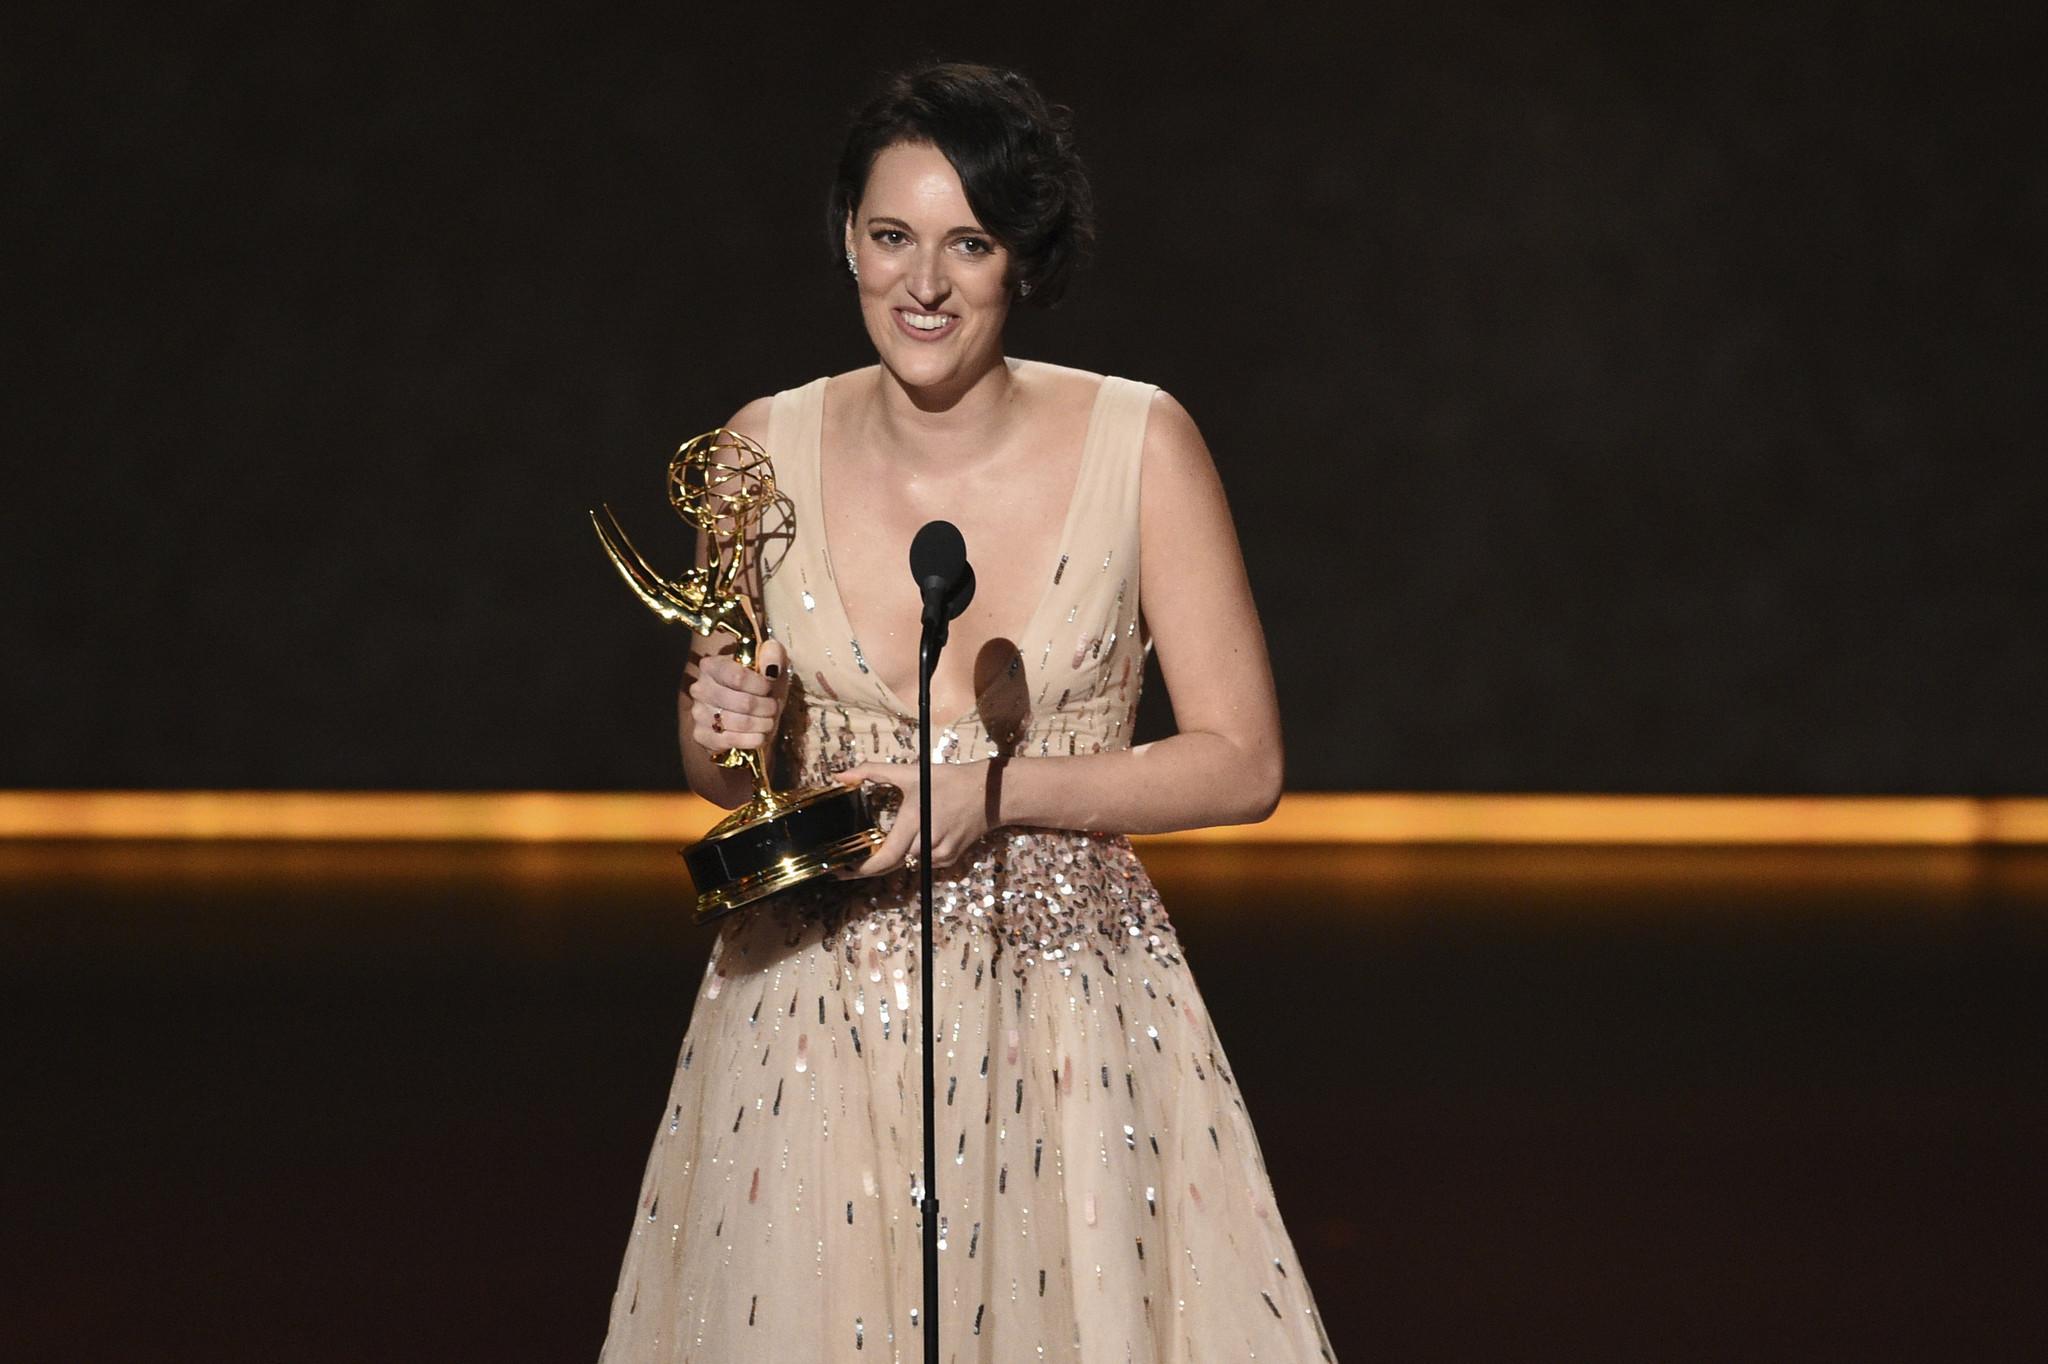 Julia Louis-Dreyfus loses final 'Veep' acting Emmy to Phoebe Waller-Bridge in 'Fleabag' upset